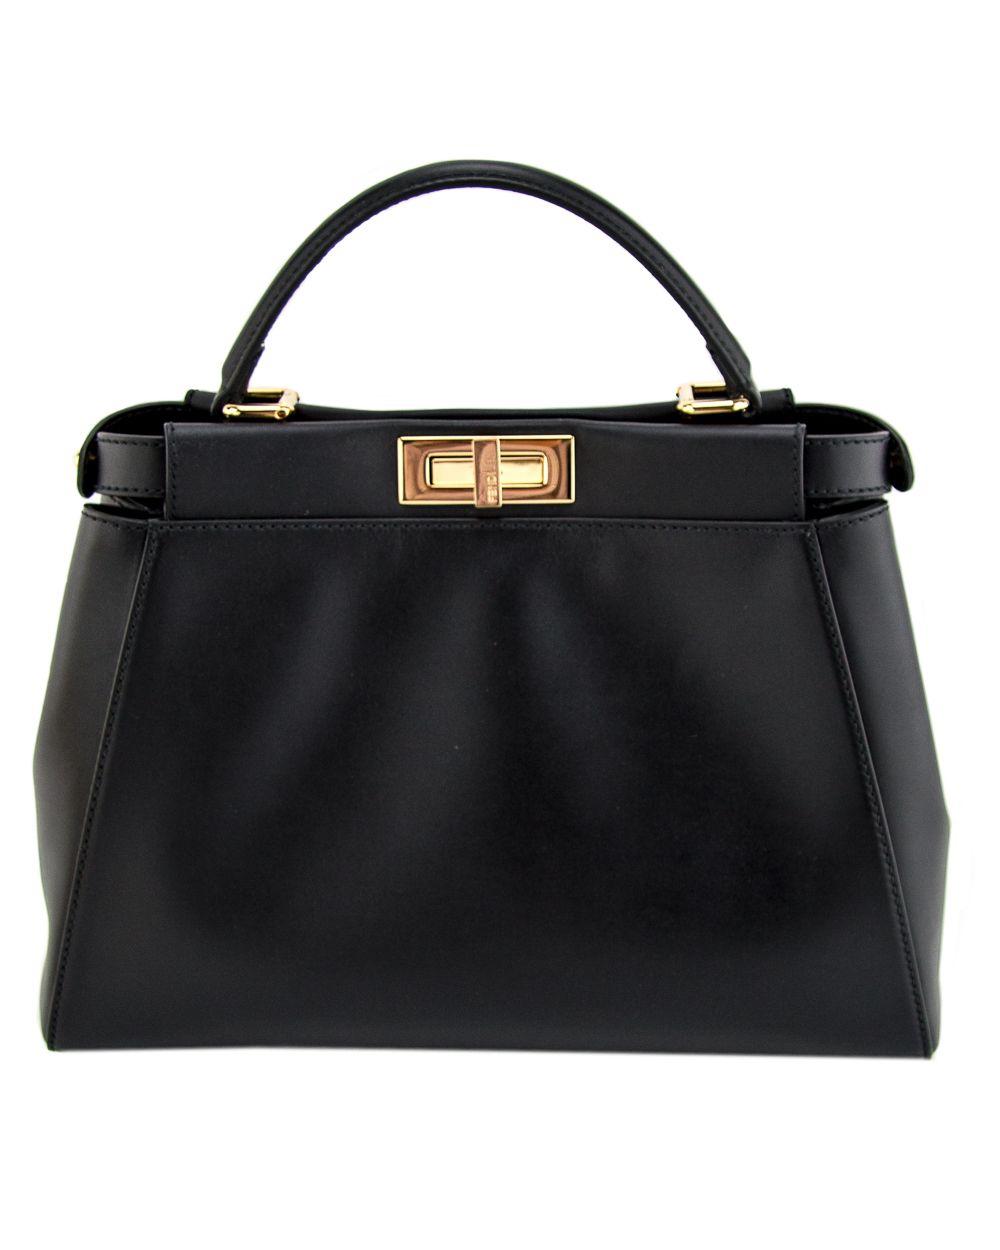 cb8e3cc8dfa2 Fendi Black Large Nappa Leather Peekaboo Tote Front and back turn-lock  closure Gold-